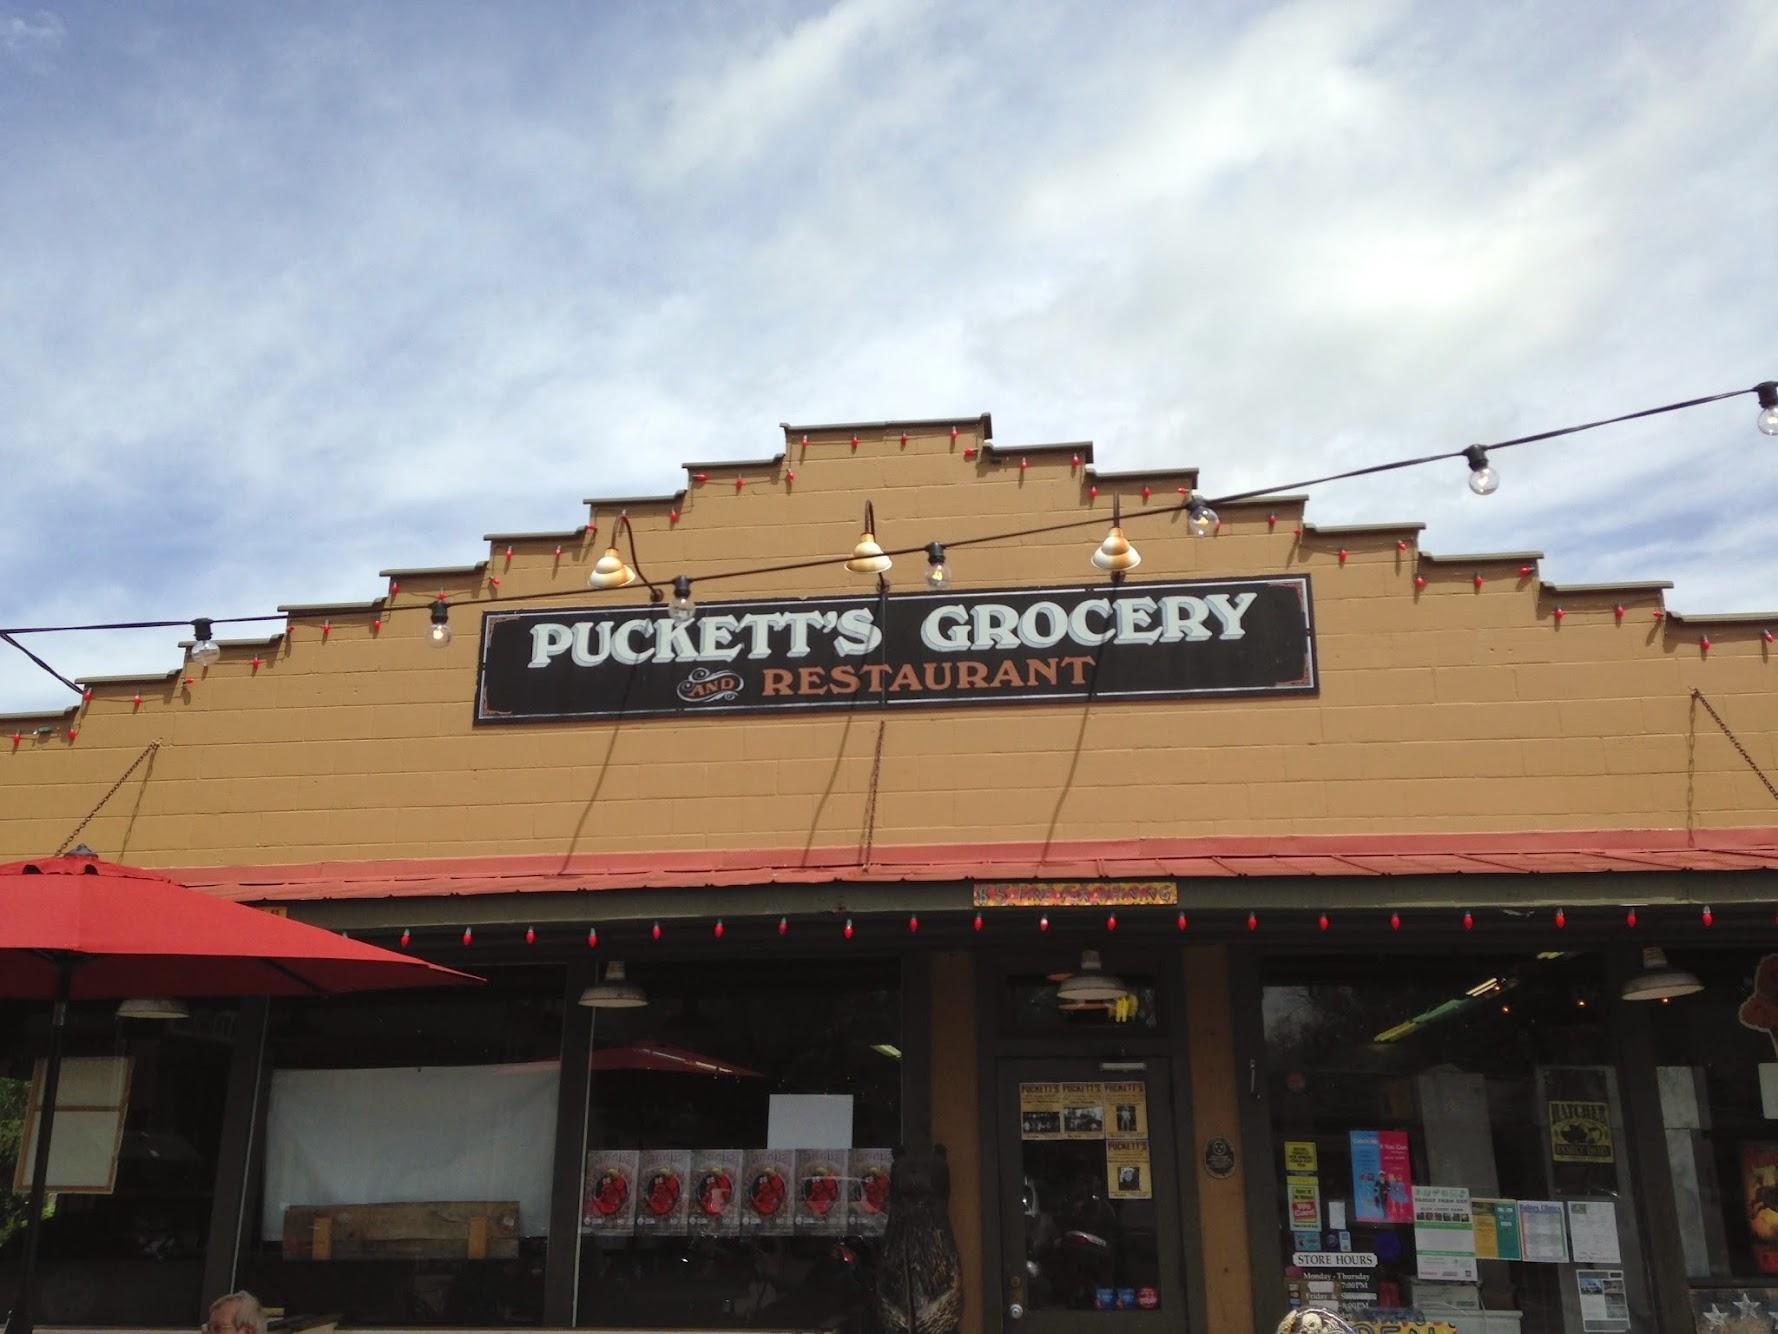 Puckett's Grocery